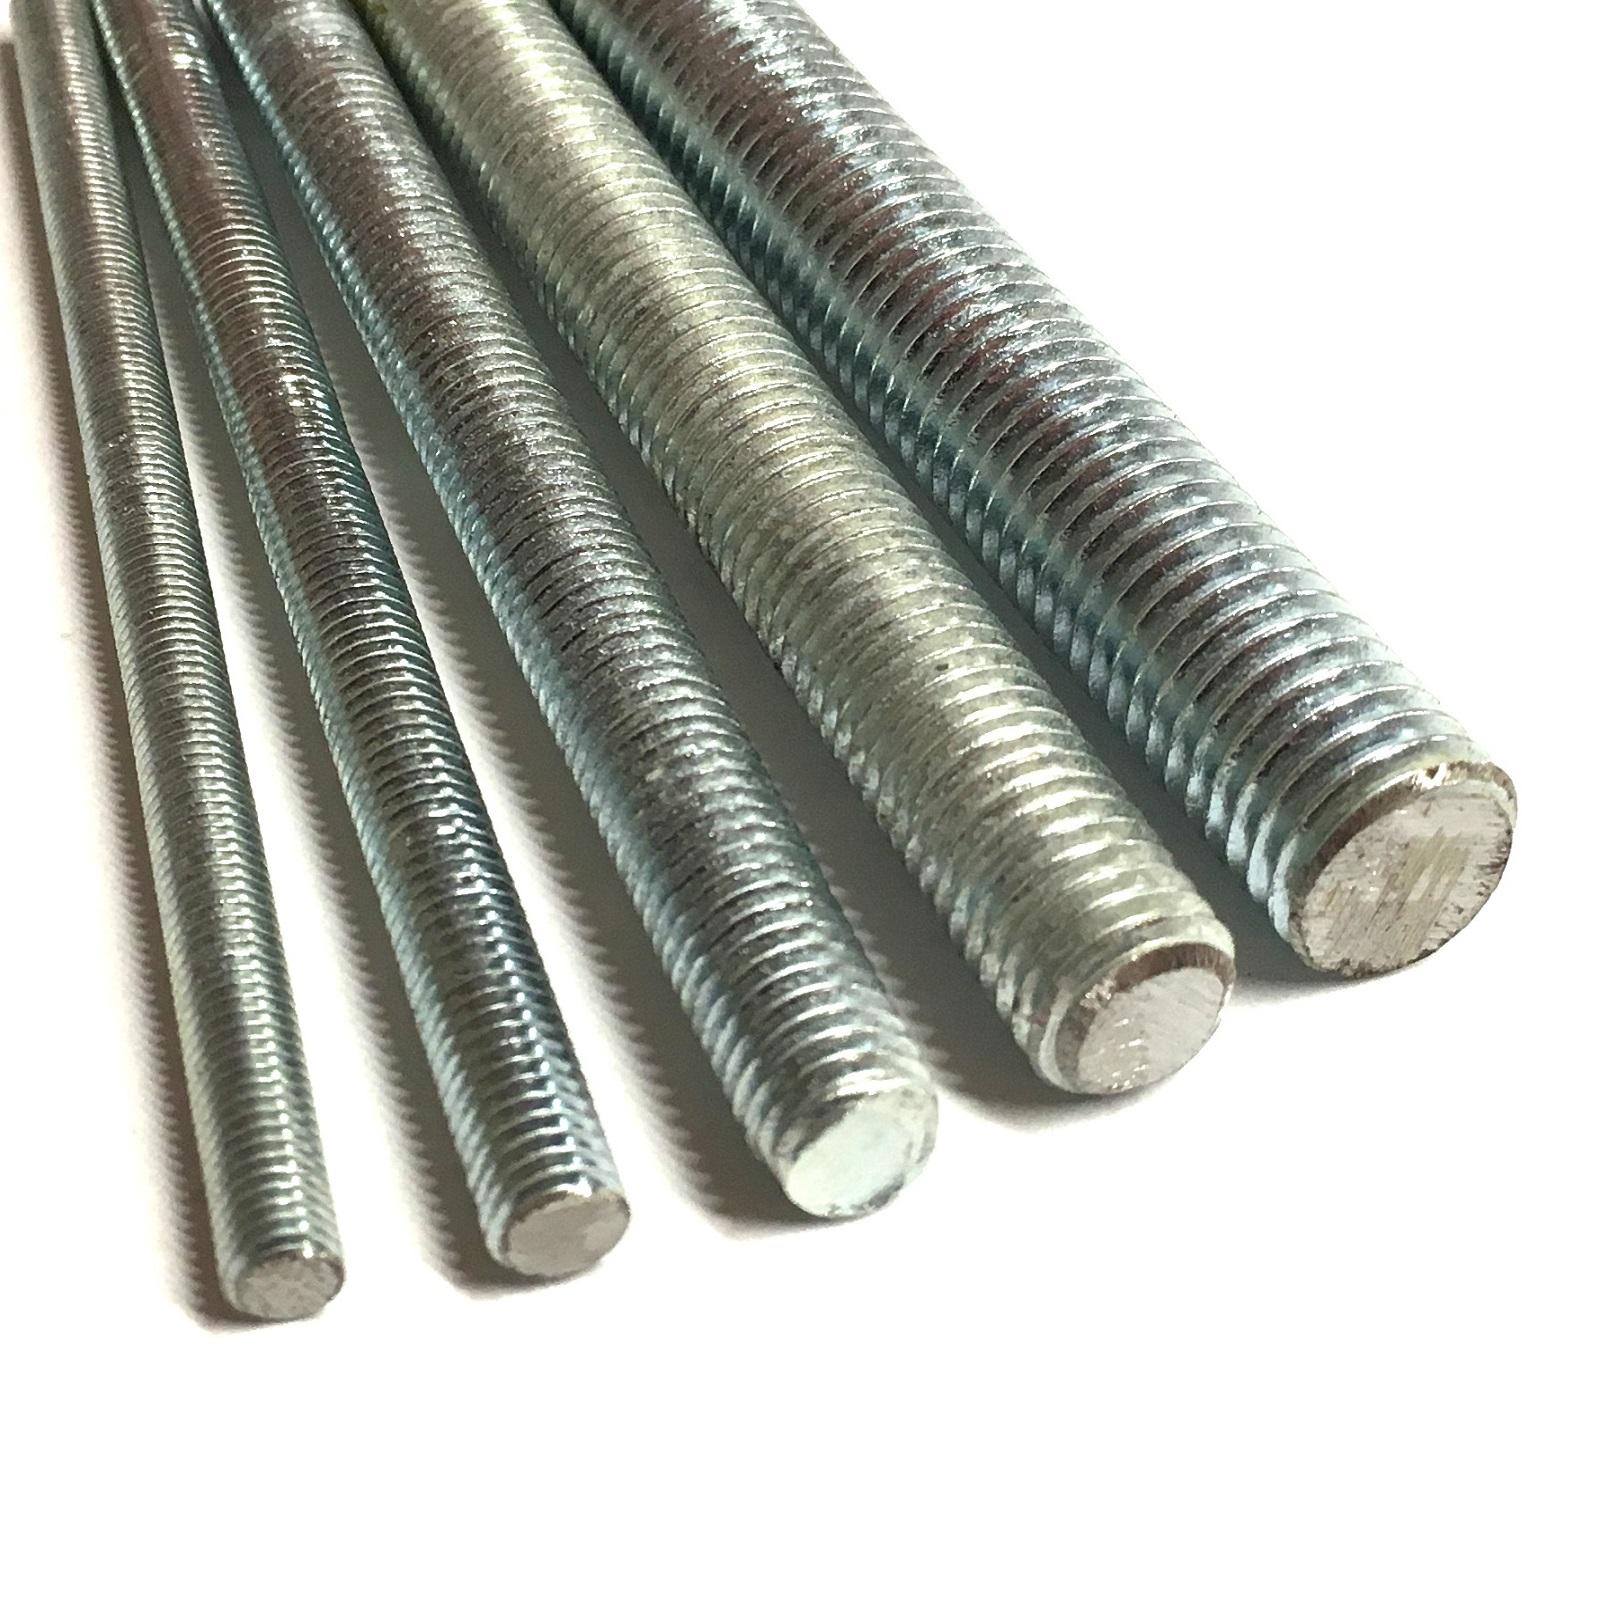 1 Metre of M4 or 4mm Zinc Plated Threaded Bar Threaded Studding Stud Bar